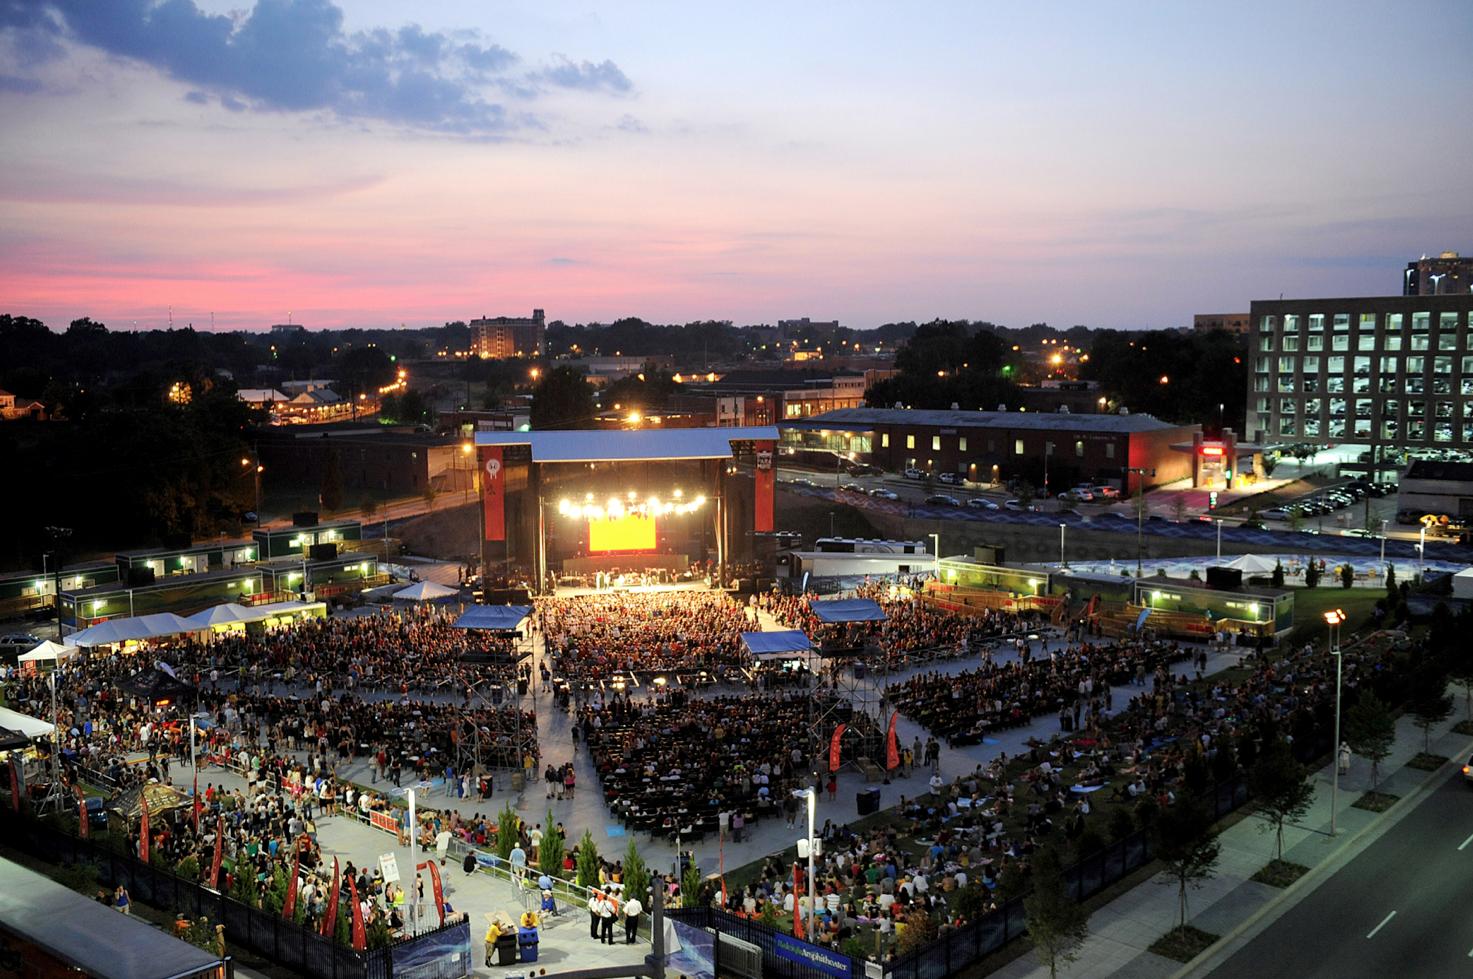 Red Hat Amphitheater  BEST LIVE MUSIC VENUE  Photo COURTESY OF Red Hat Amphitheater / Raleigh Convention Center